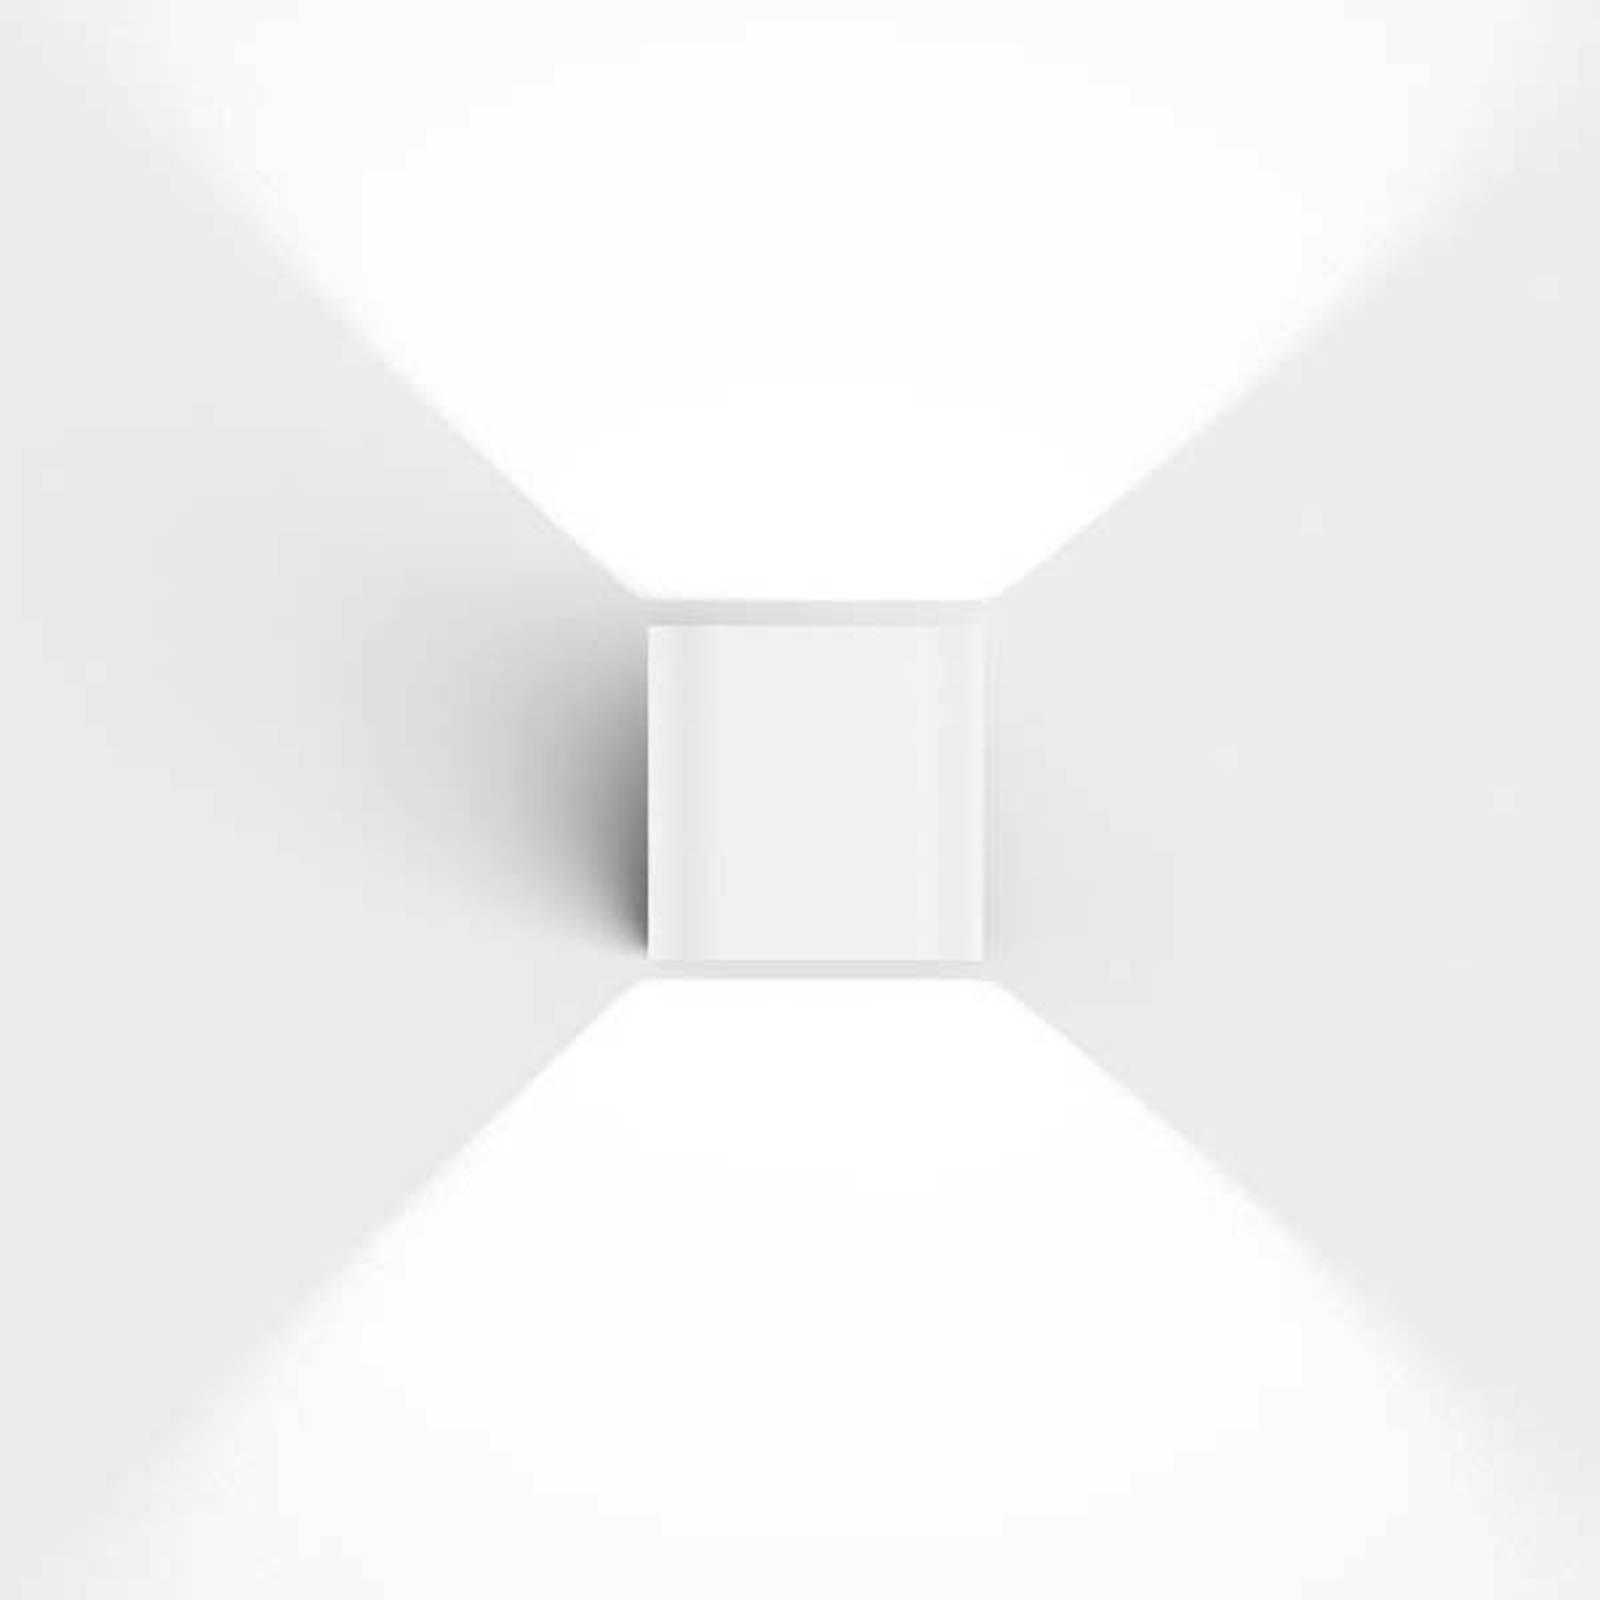 IP44.de Intro 2.0 LED-Außenwandleuchte, pure white